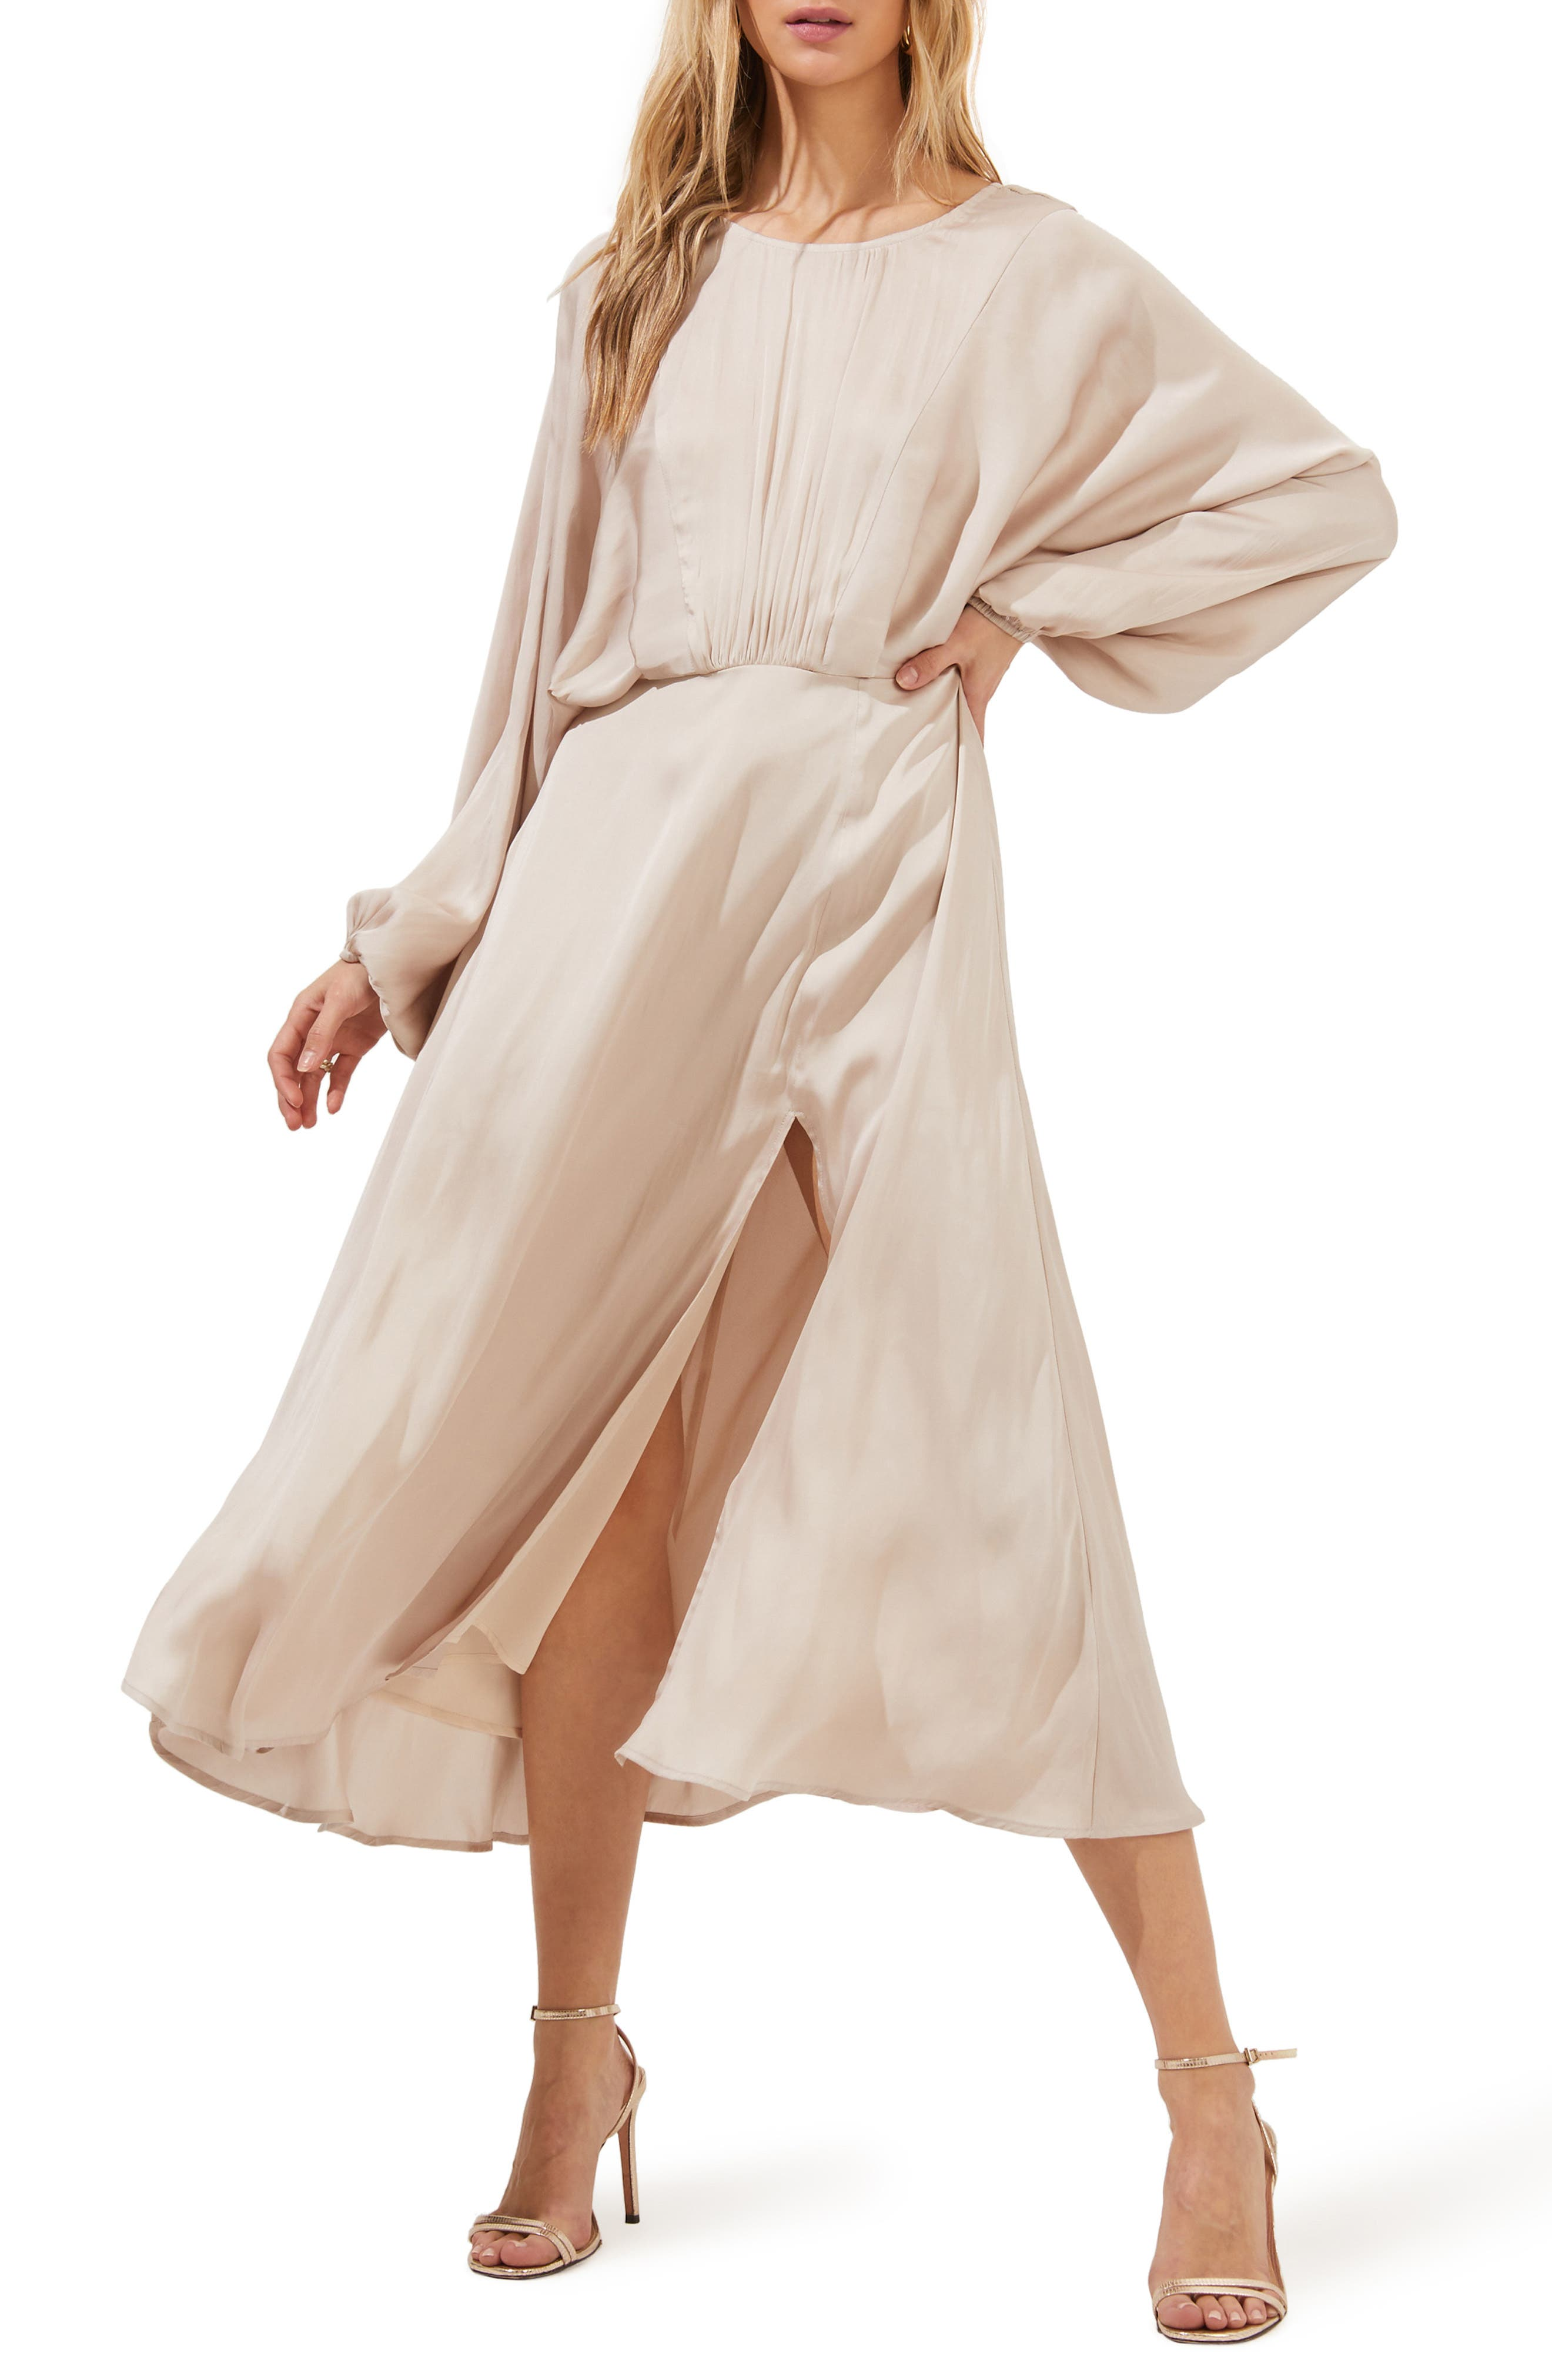 Long Dolman Sleeve Dress